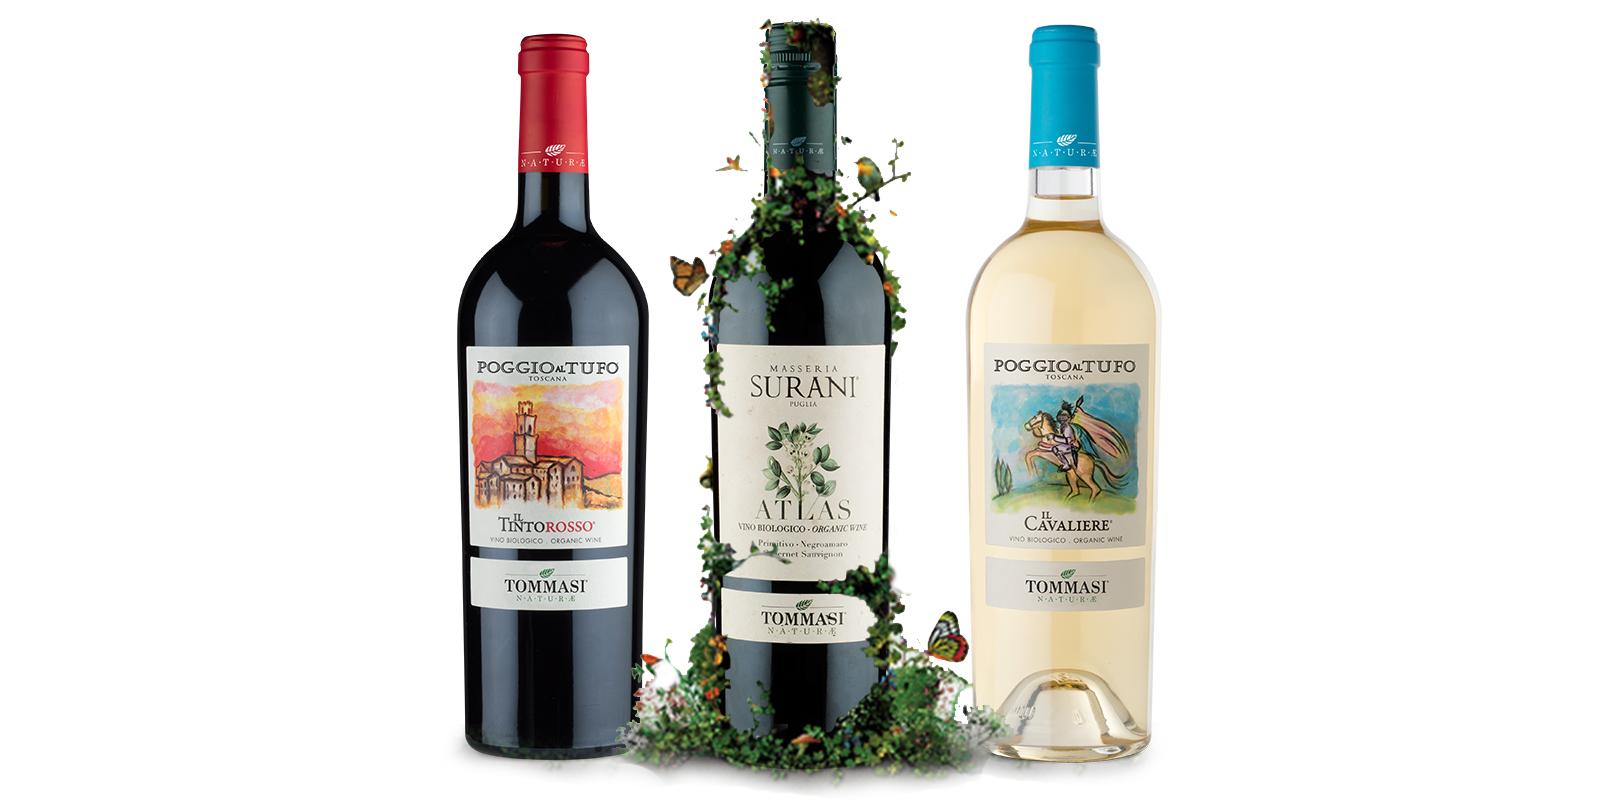 tommasi-organic-wines